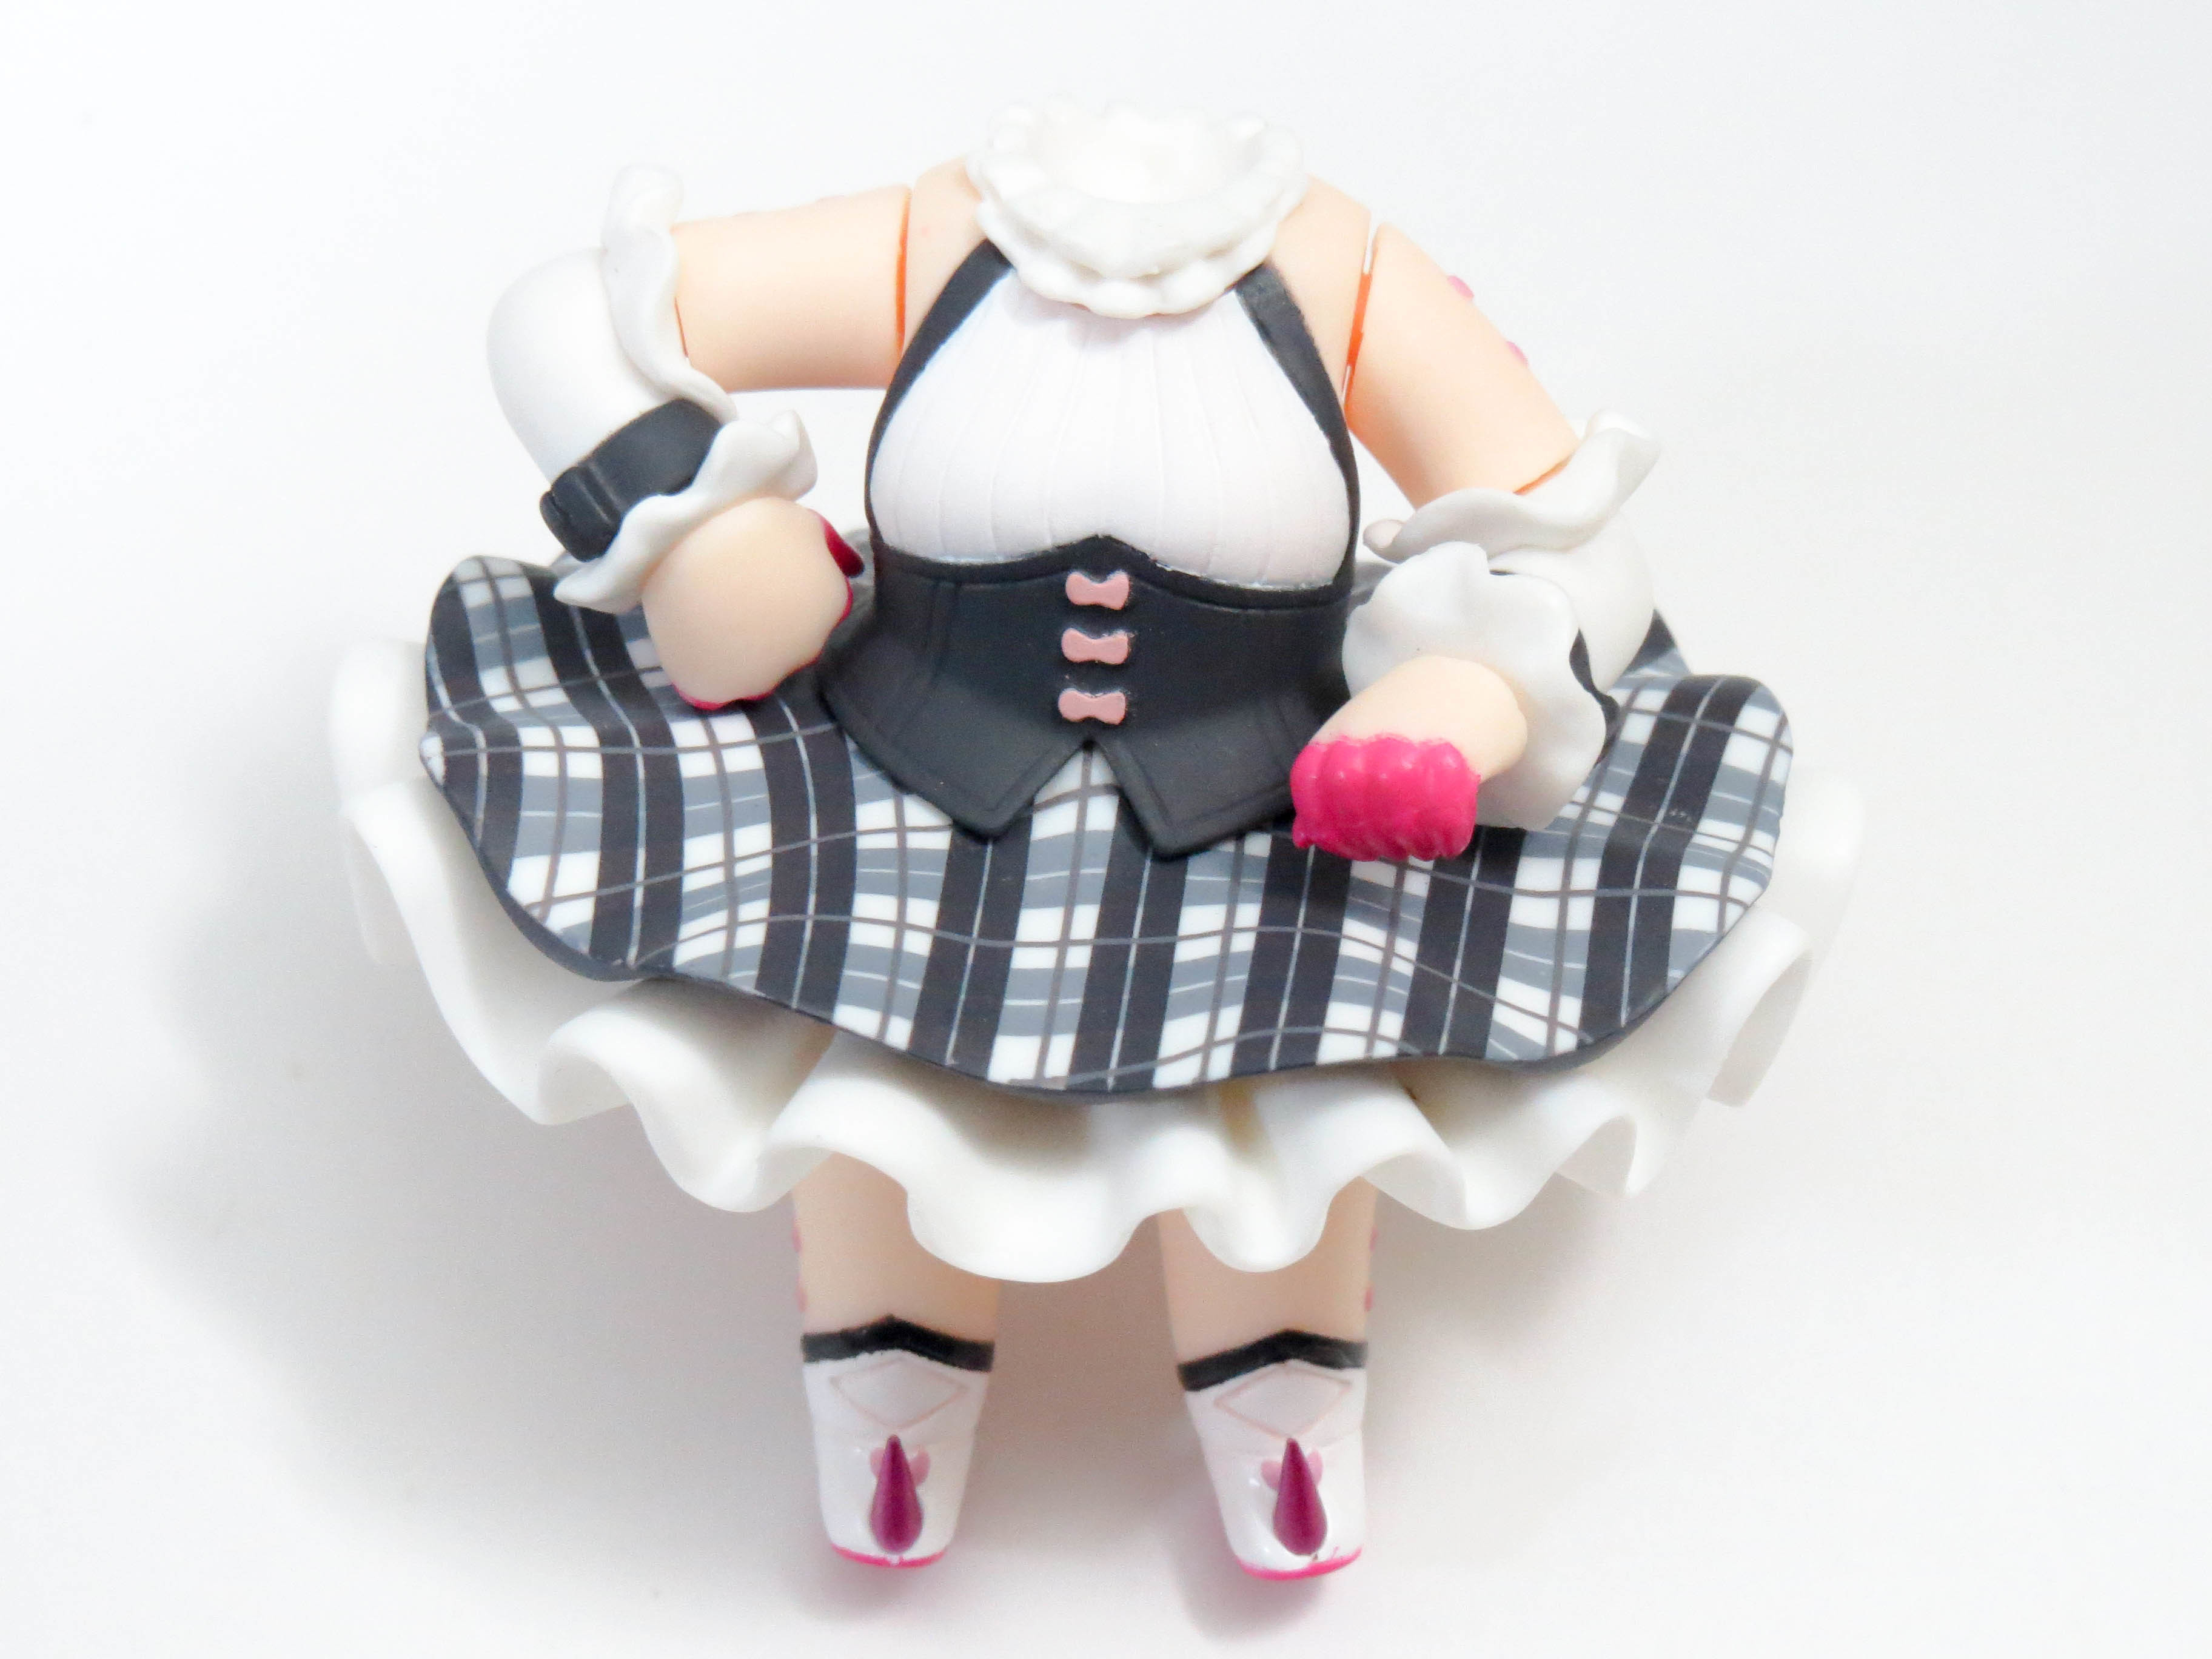 【SALE】【950】 エリザベート・バートリー 体パーツ 戦闘服 ねんどろいど